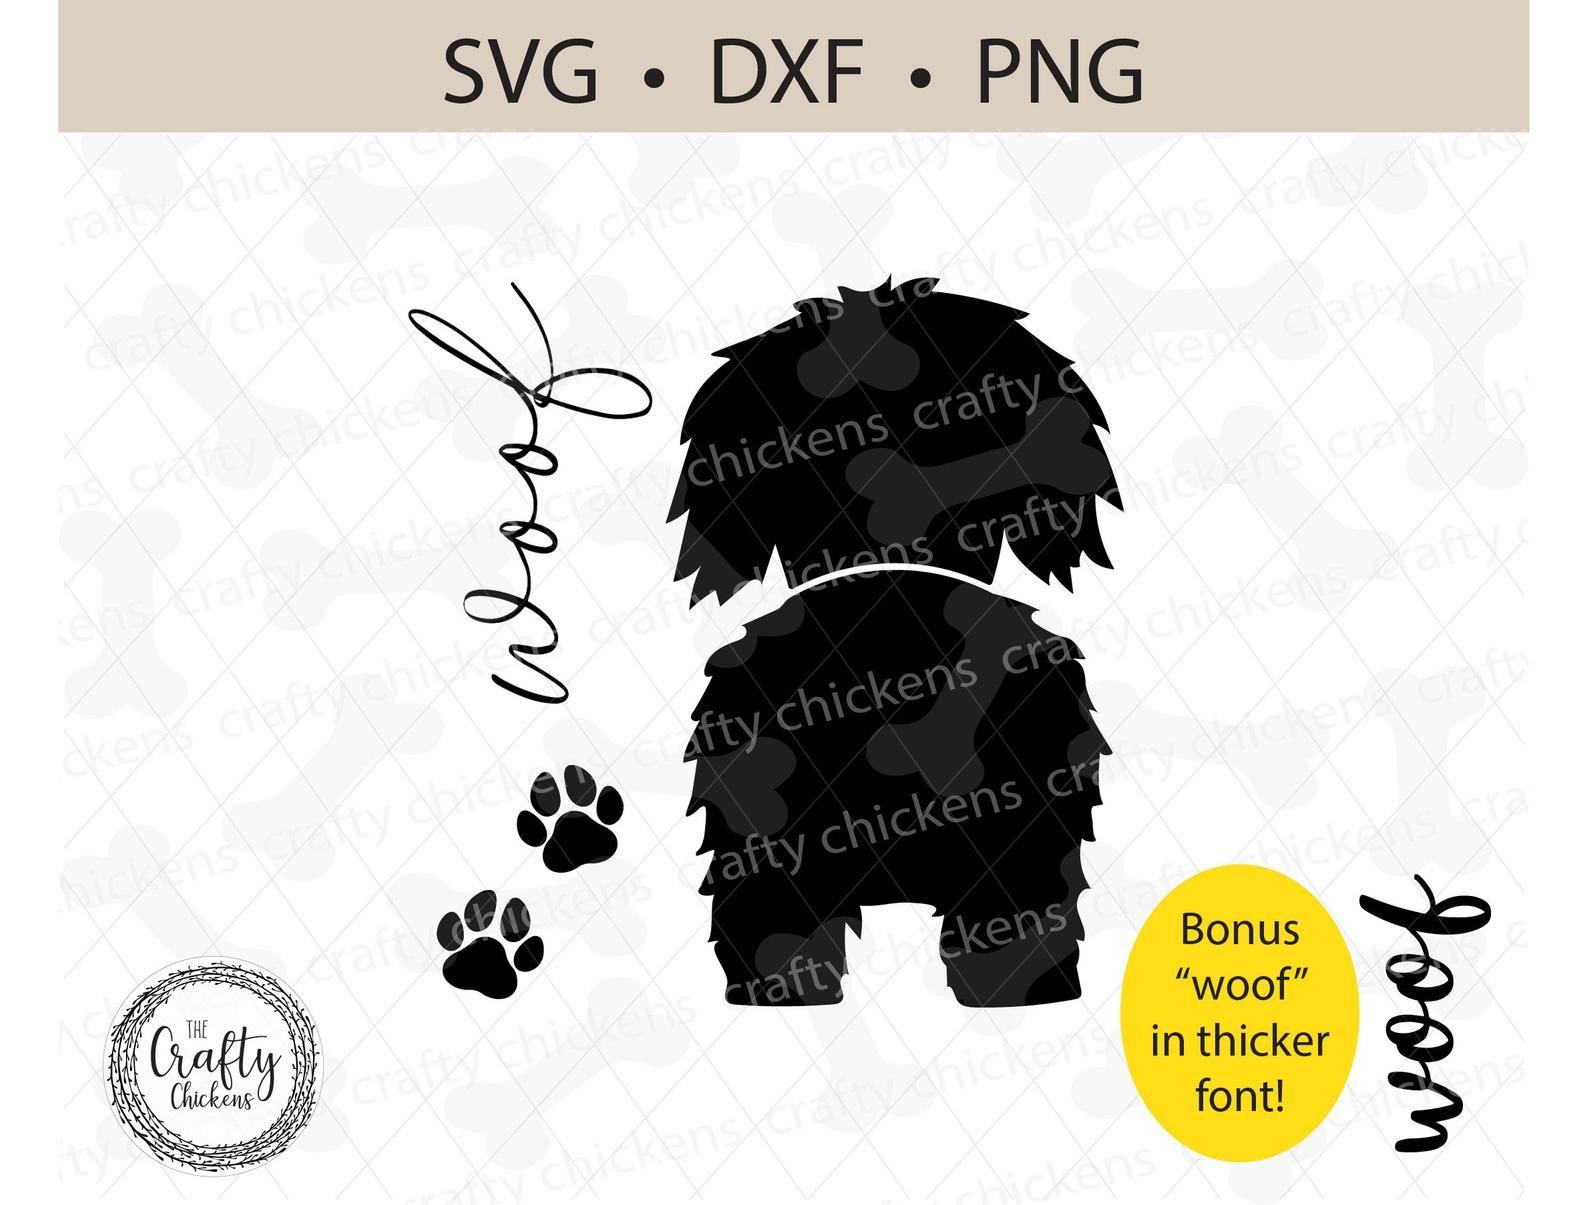 Shaggy Dog Svg Shih Tzu Toy Poodle Mix Maltese Digital Etsy In 2021 Svg Dog Silhouette Dogs